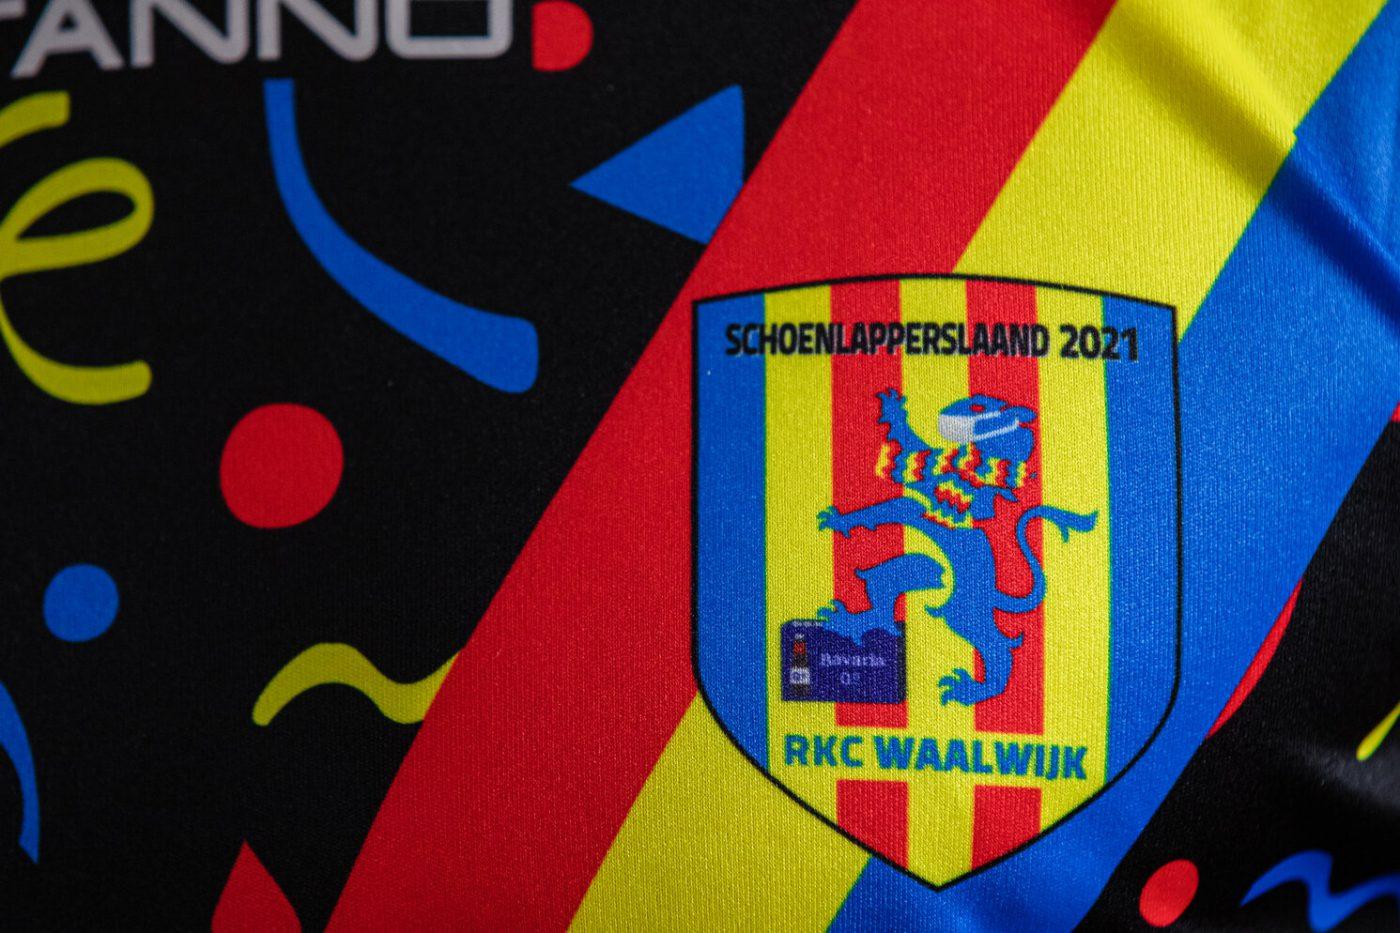 maillot-carnaval-RKC-Waalwijk-2021-stanno-2